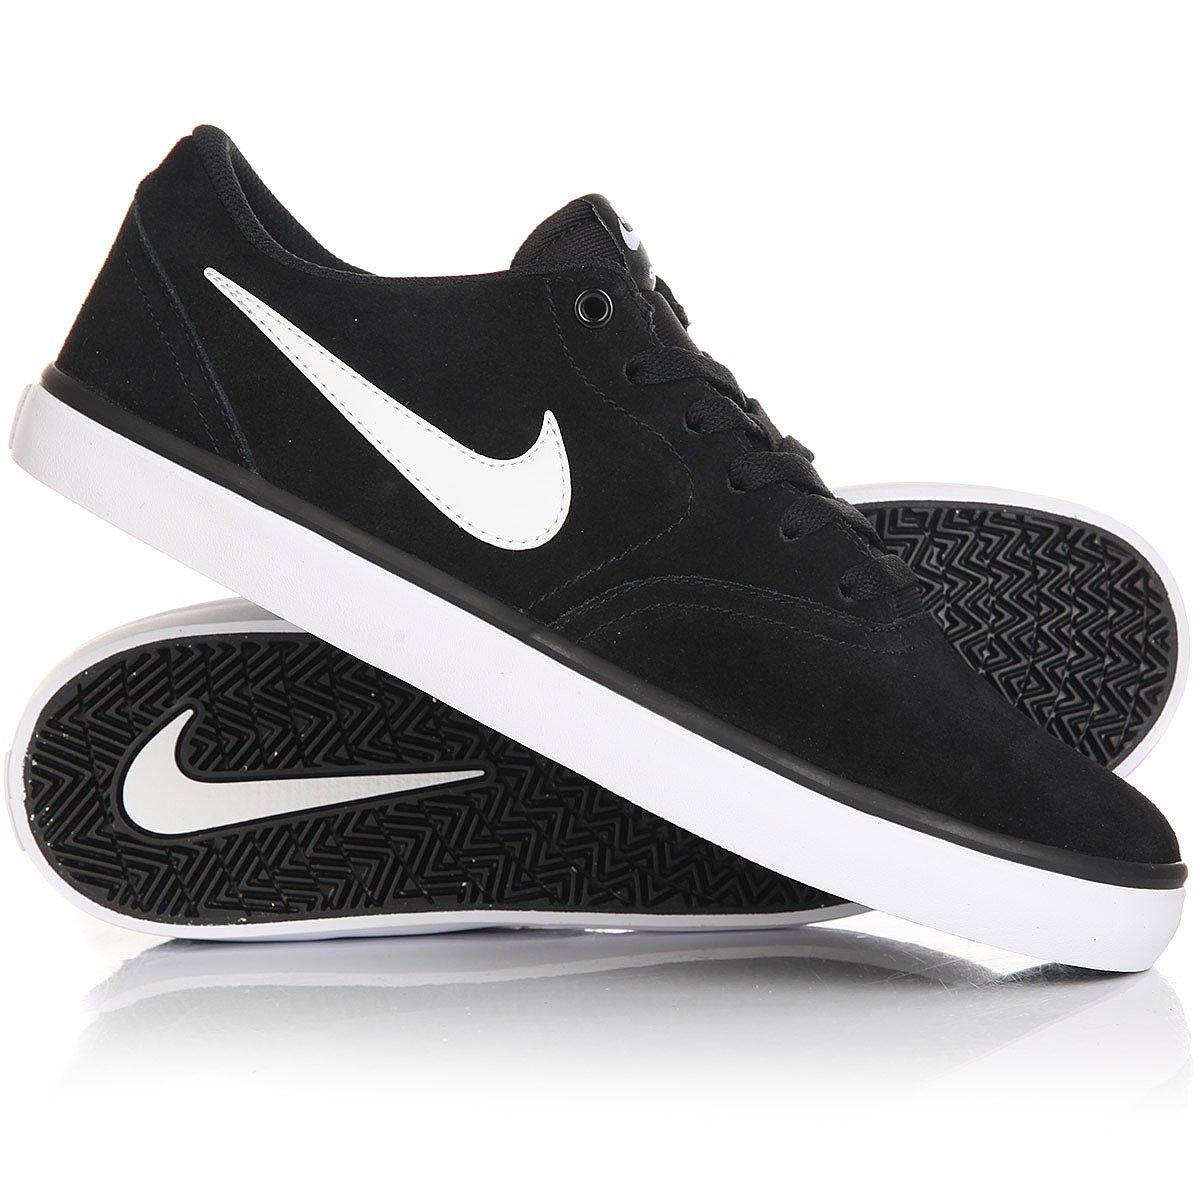 weiß 001 Sneaker 843895 Nike schwarz Solar Herren SB Check Skateschuh eQBoxWrdC